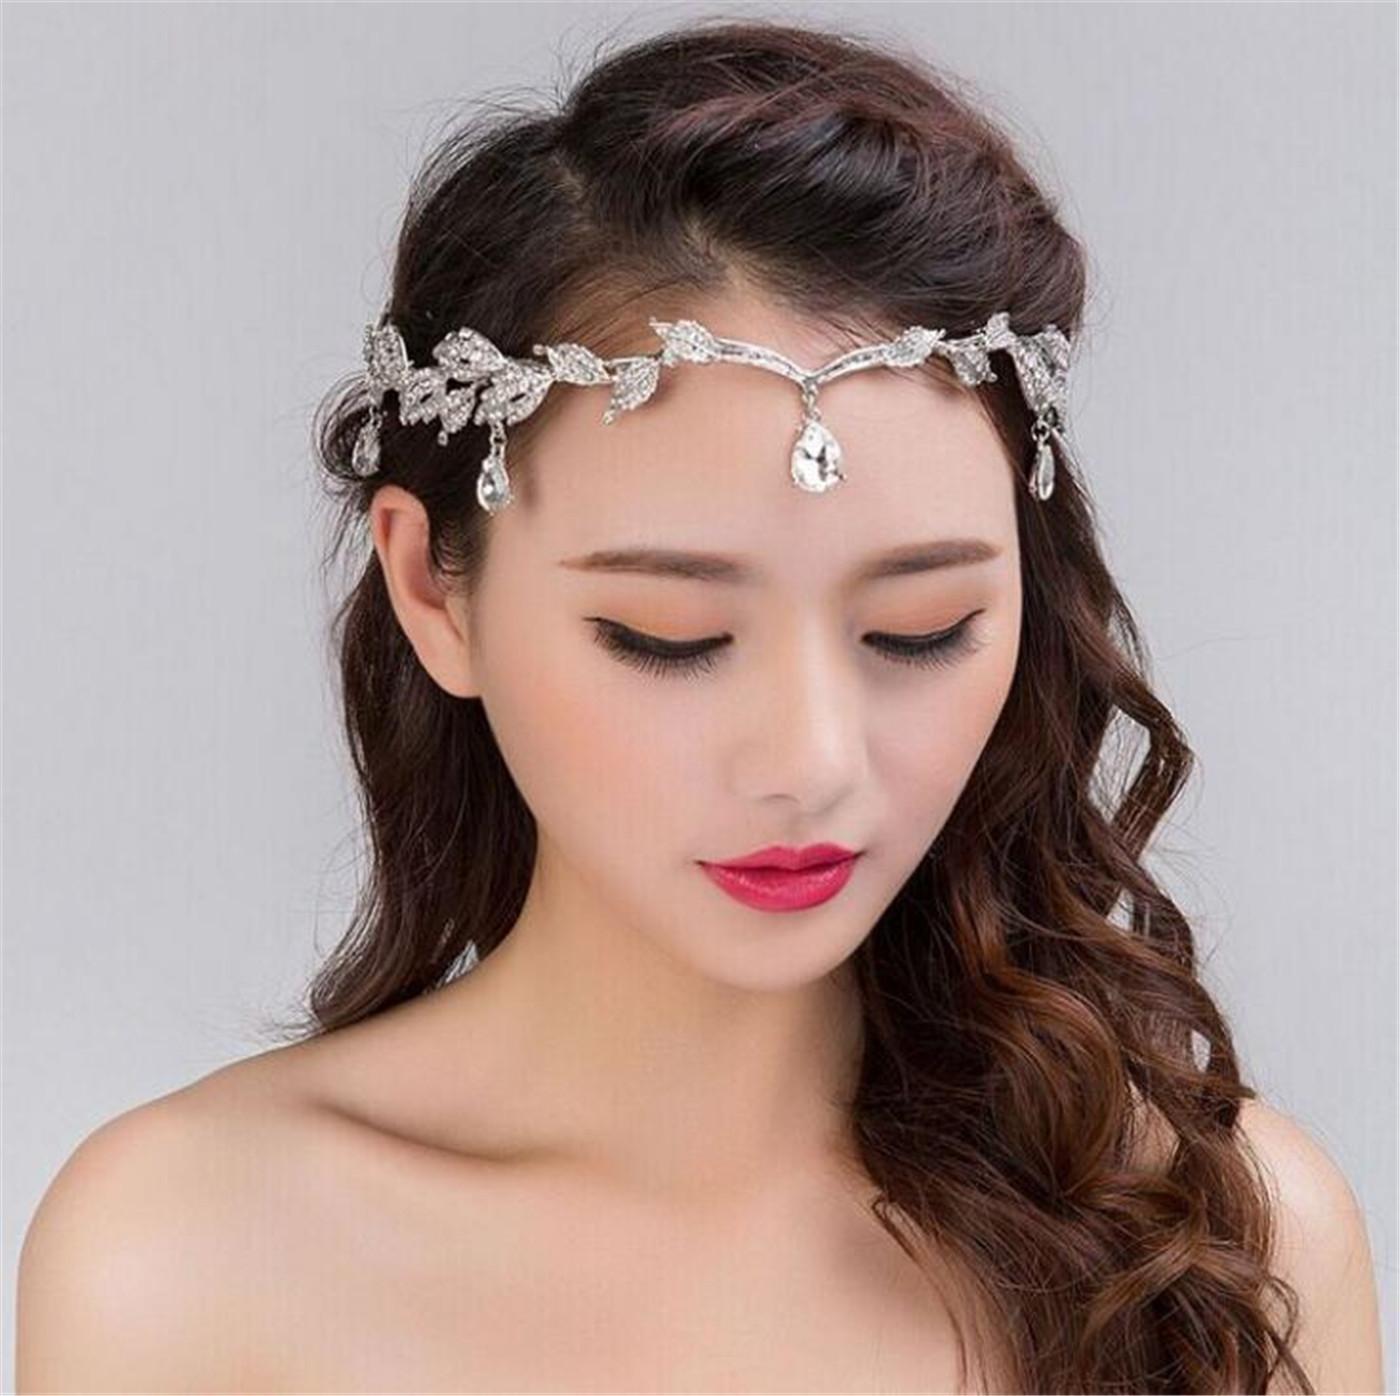 Cristal Bridal Tiara Coroa de Casamento Headband Headband Hapridemaid Jóias Acessório Rhinestone Waterdrop Folha Frontline